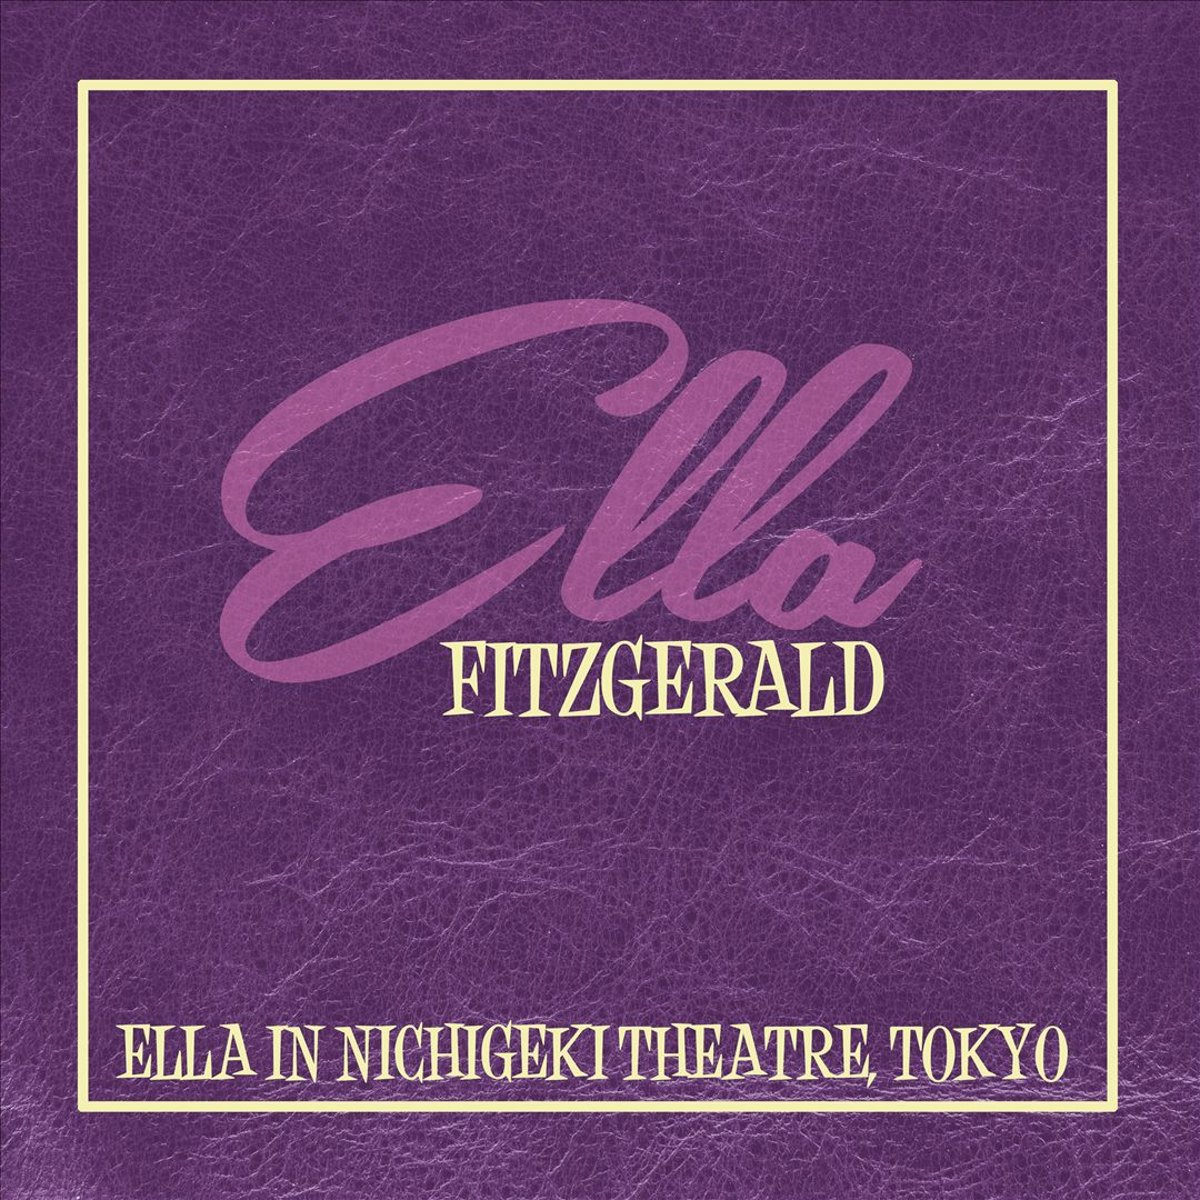 Элла Фитцжеральд Ella Fitzgerald. Ella In Nichigeki Theatre, Tok (LP) элла фитцжеральд луи армстронг оскар питерсон херб эллис ella fitzgerald